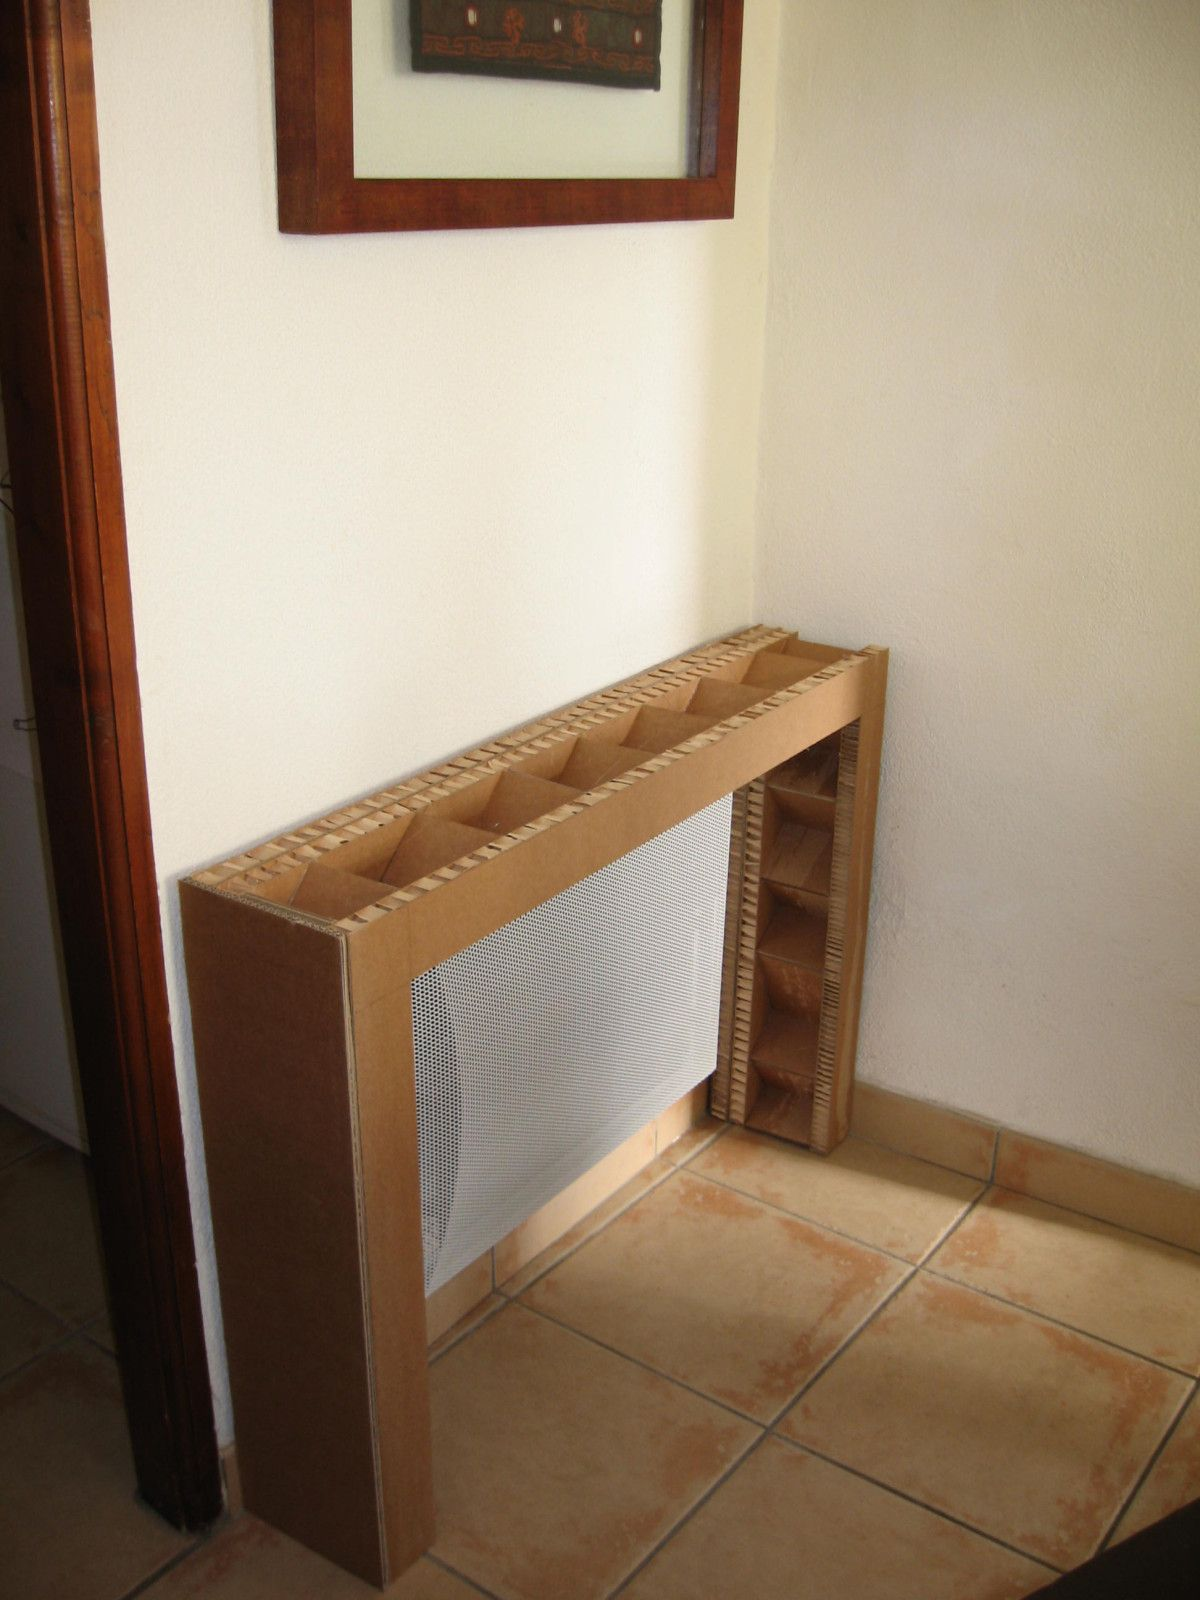 Comment cr er un meuble en carton tape par tape - Meuble en carton tuto ...